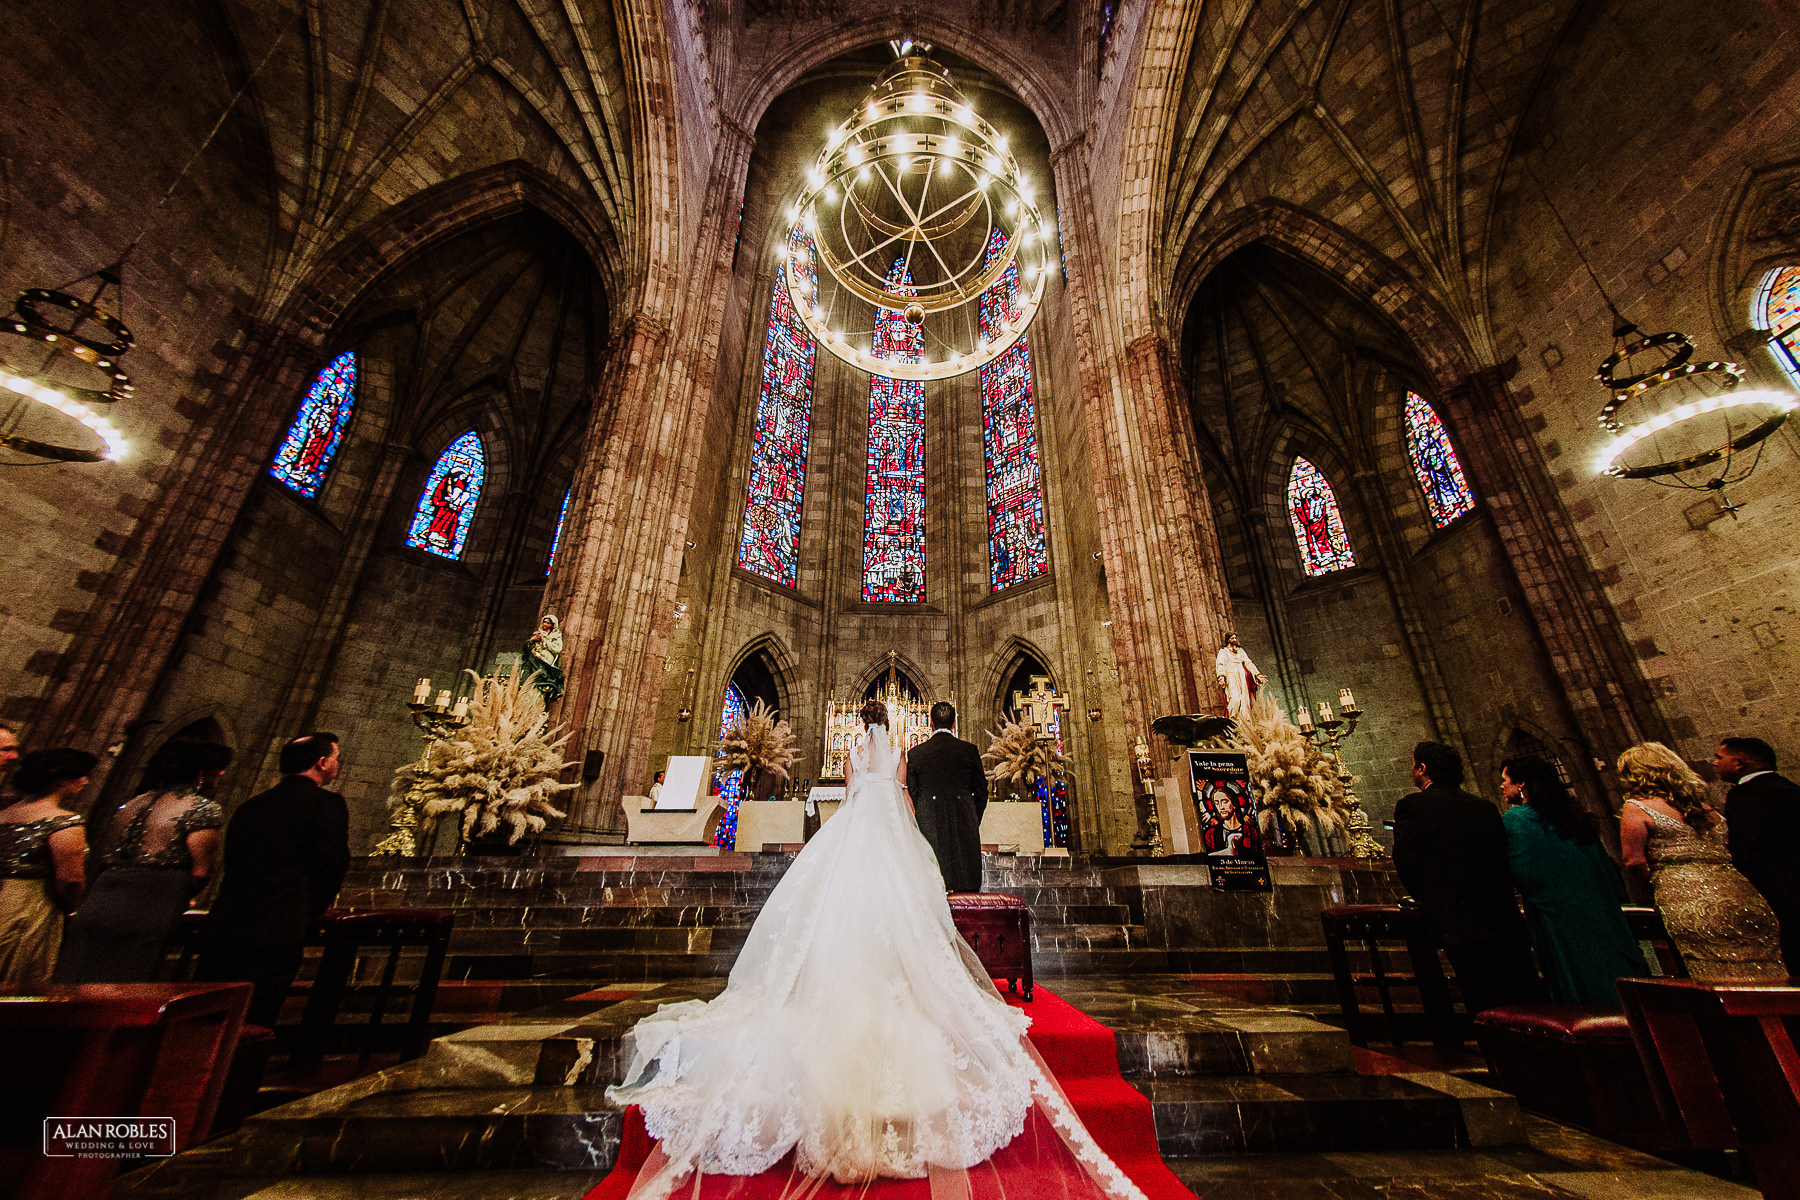 Alan Robles fotografo de bodas guadalajara - LyP Hotel Demetria-50